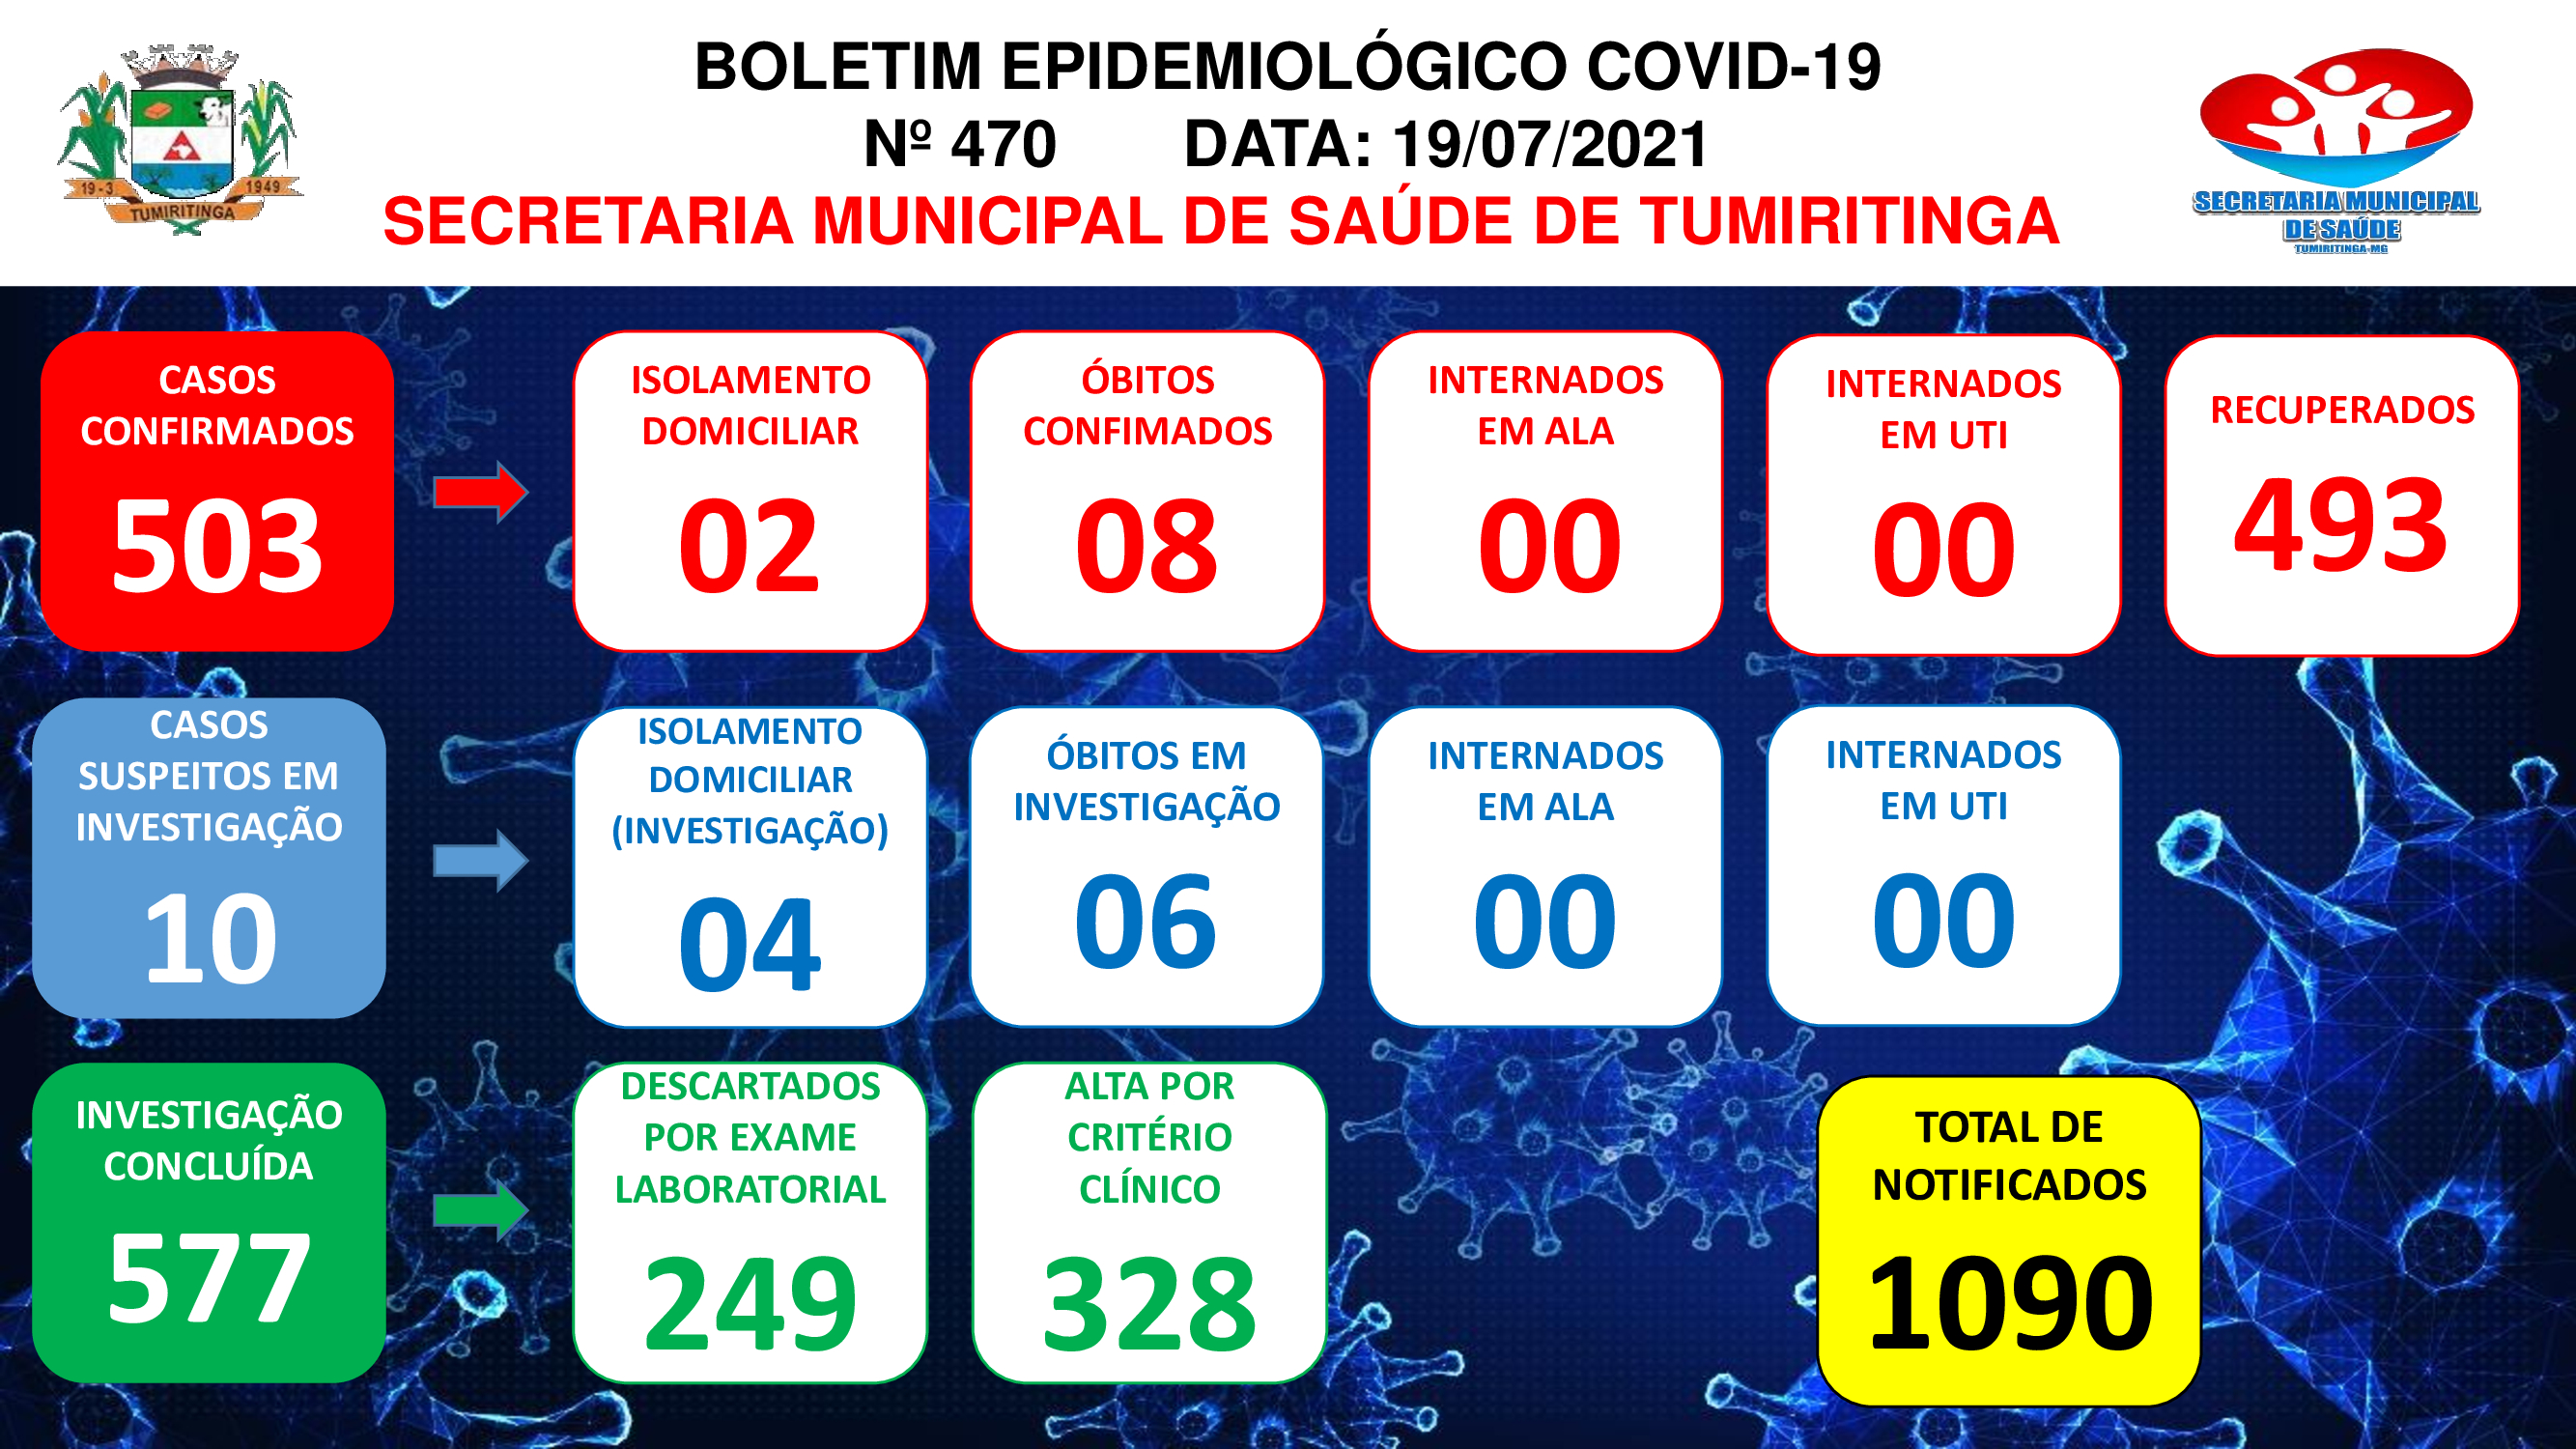 BOLETIM EPIDEMIOLÓGICO CORONAVÍRUS N° 470 - 19/07/2021